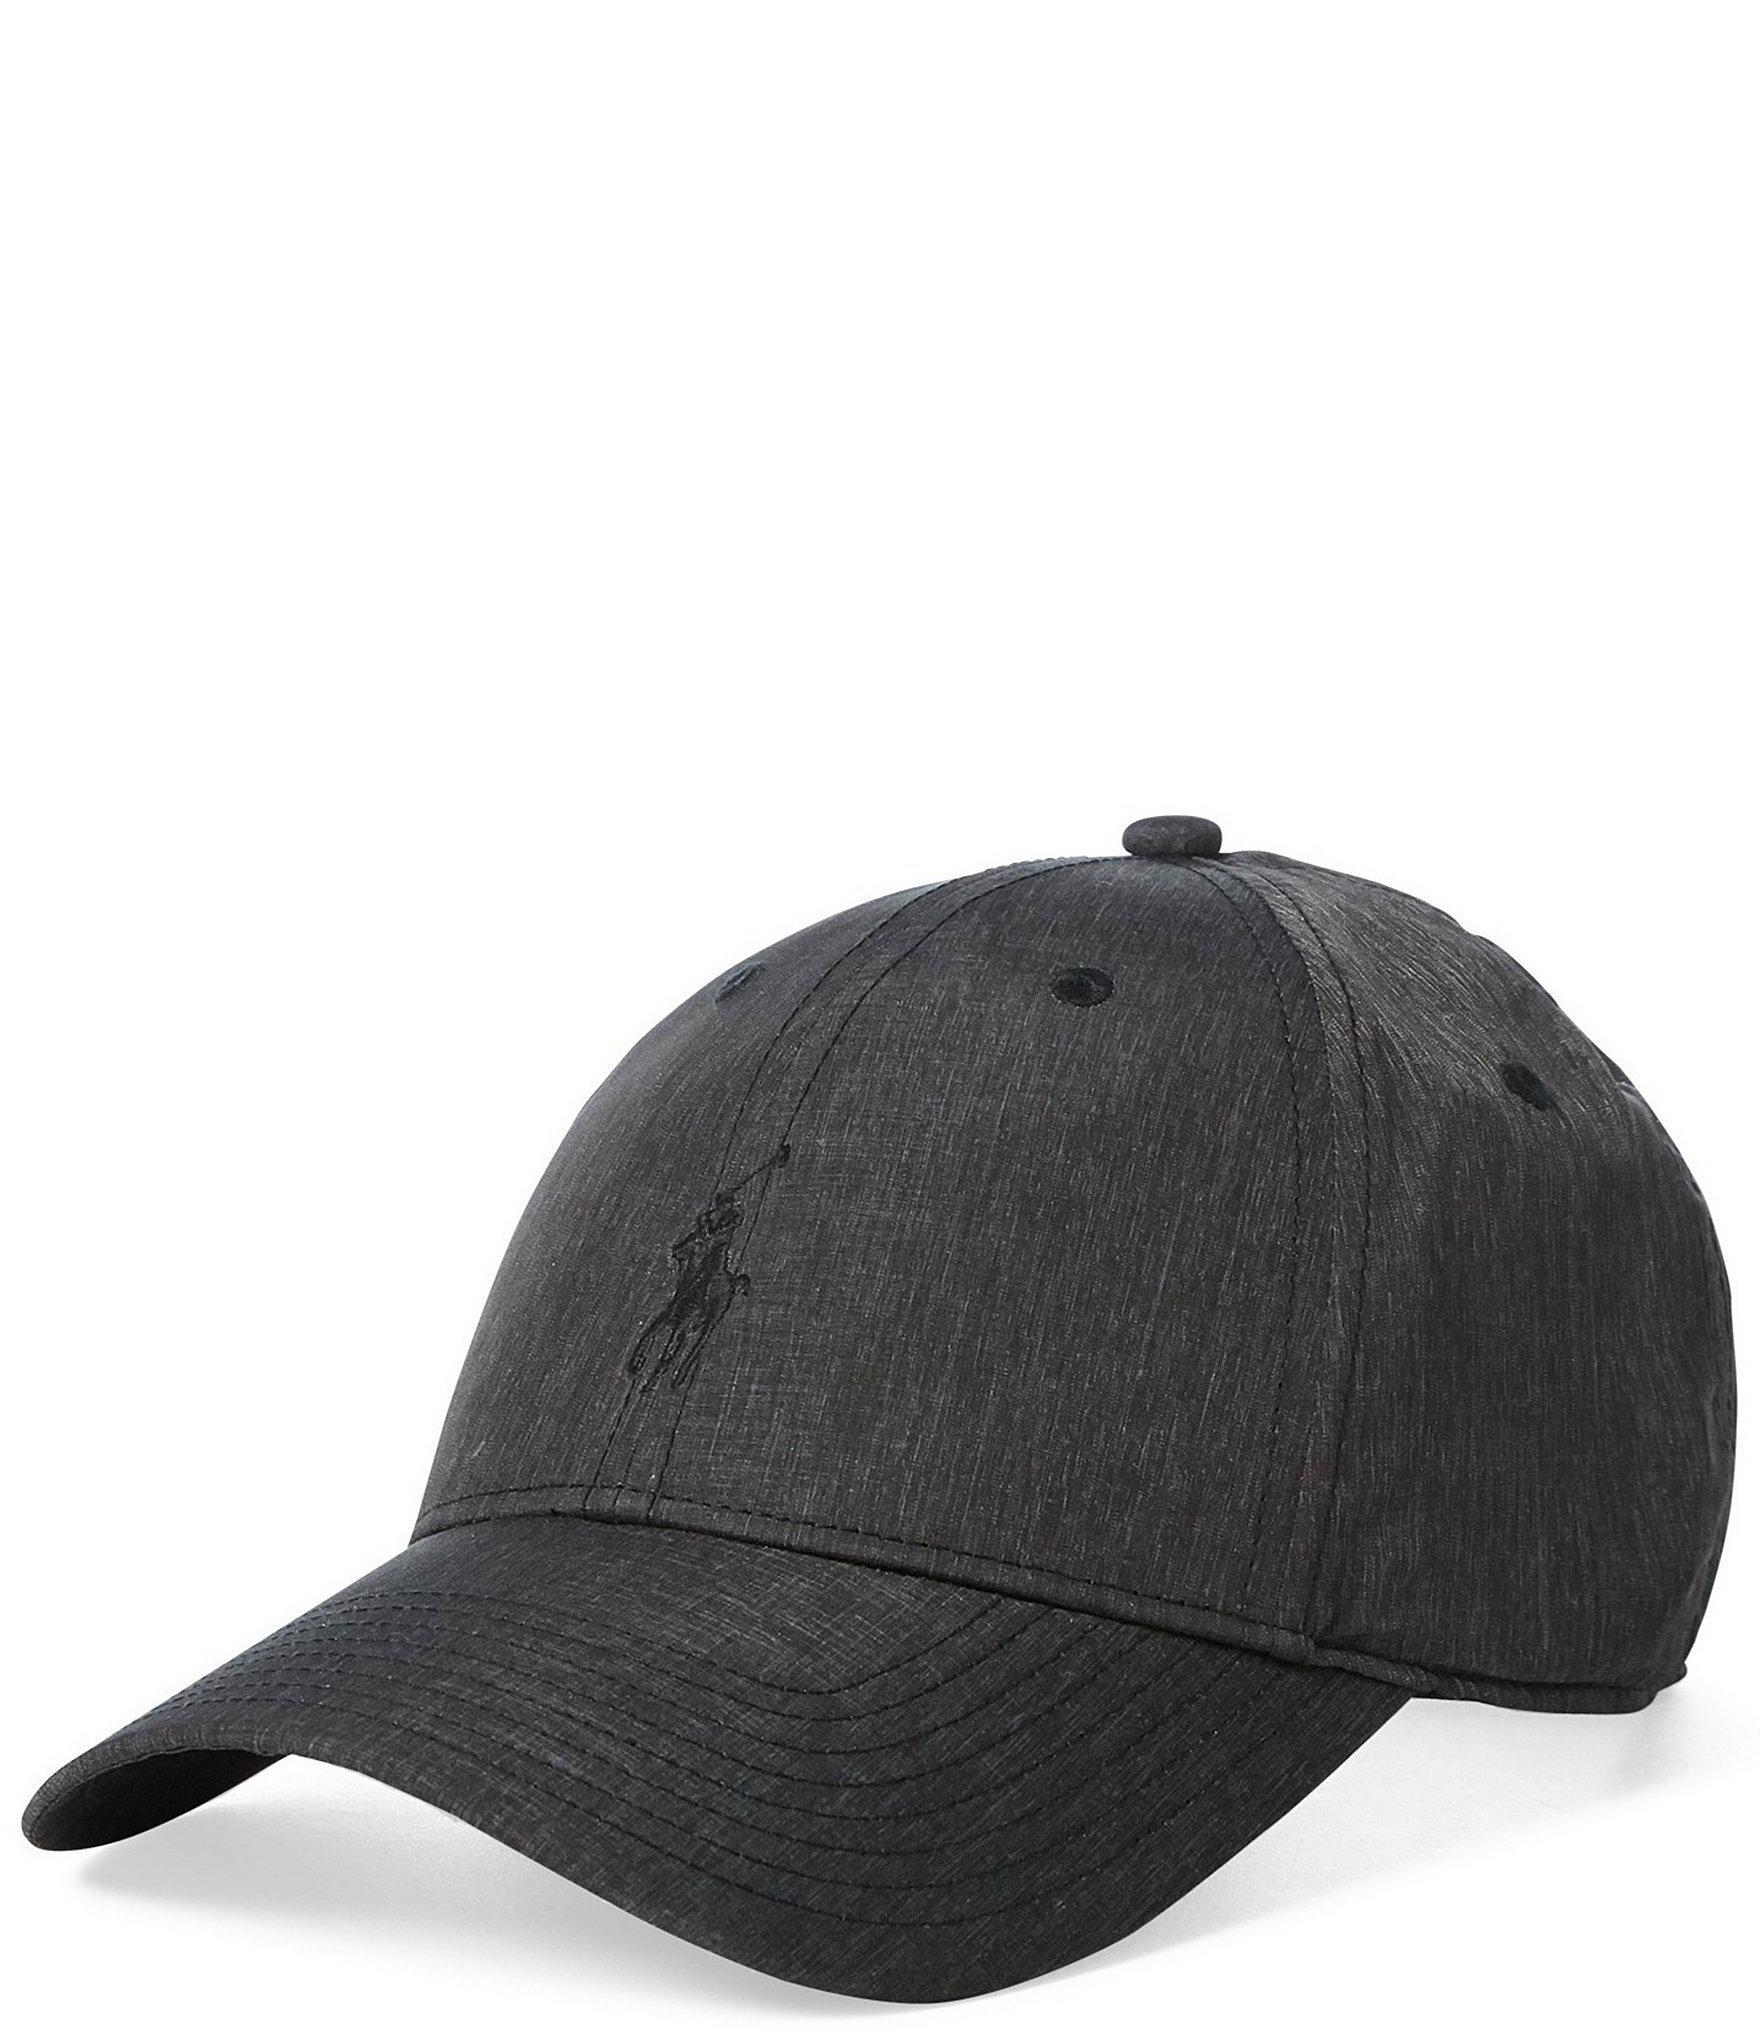 Lyst - Polo Ralph Lauren Canvas Baseline Cap in Gray for Men 7c4aab14b99c